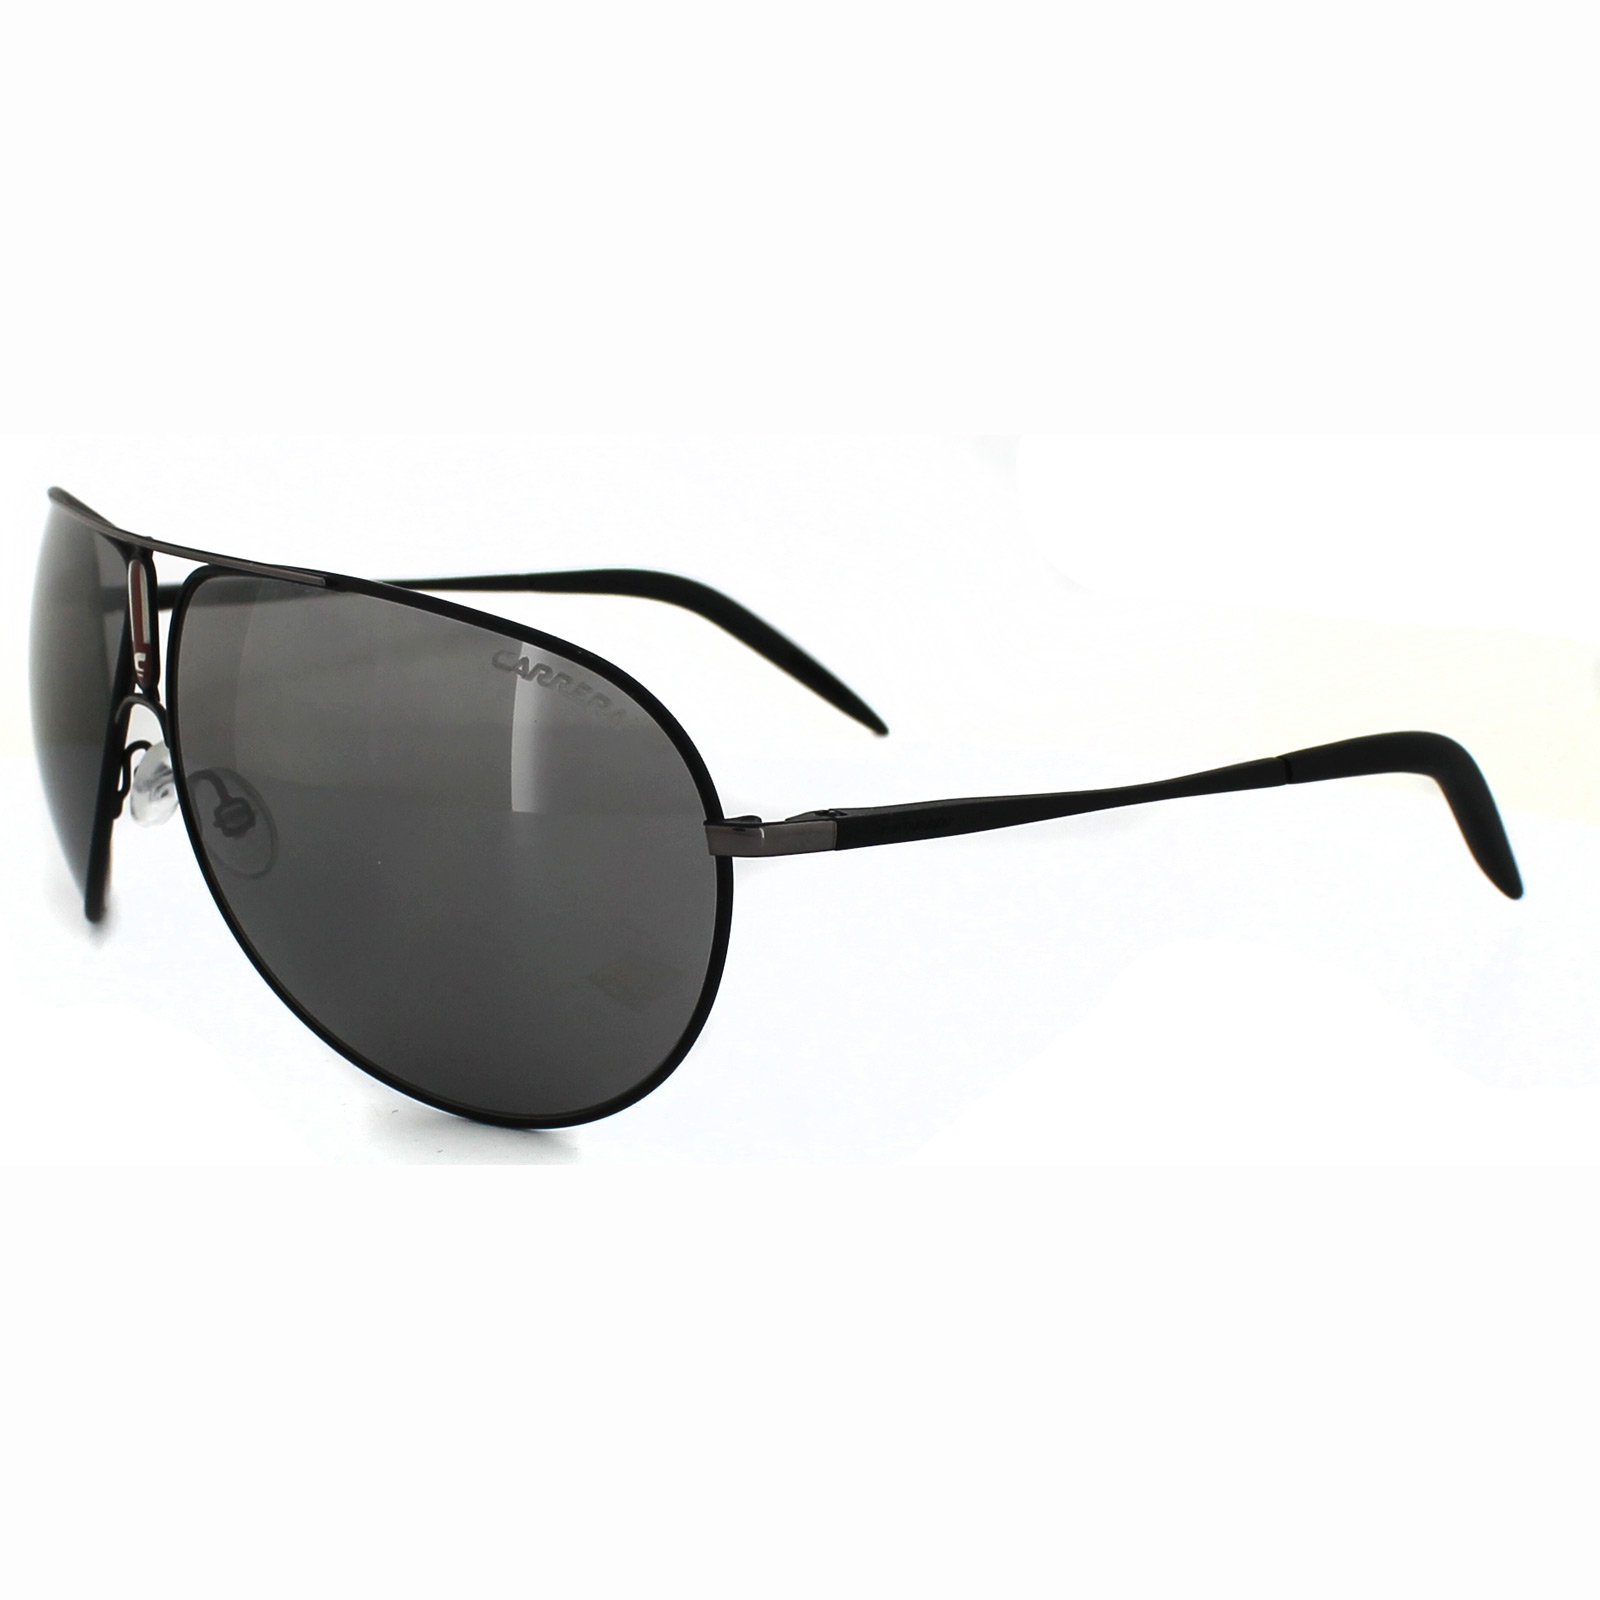 carrera sunglasses  Cheap Carrera Gipsy Sunglasses - Discounted Sunglasses